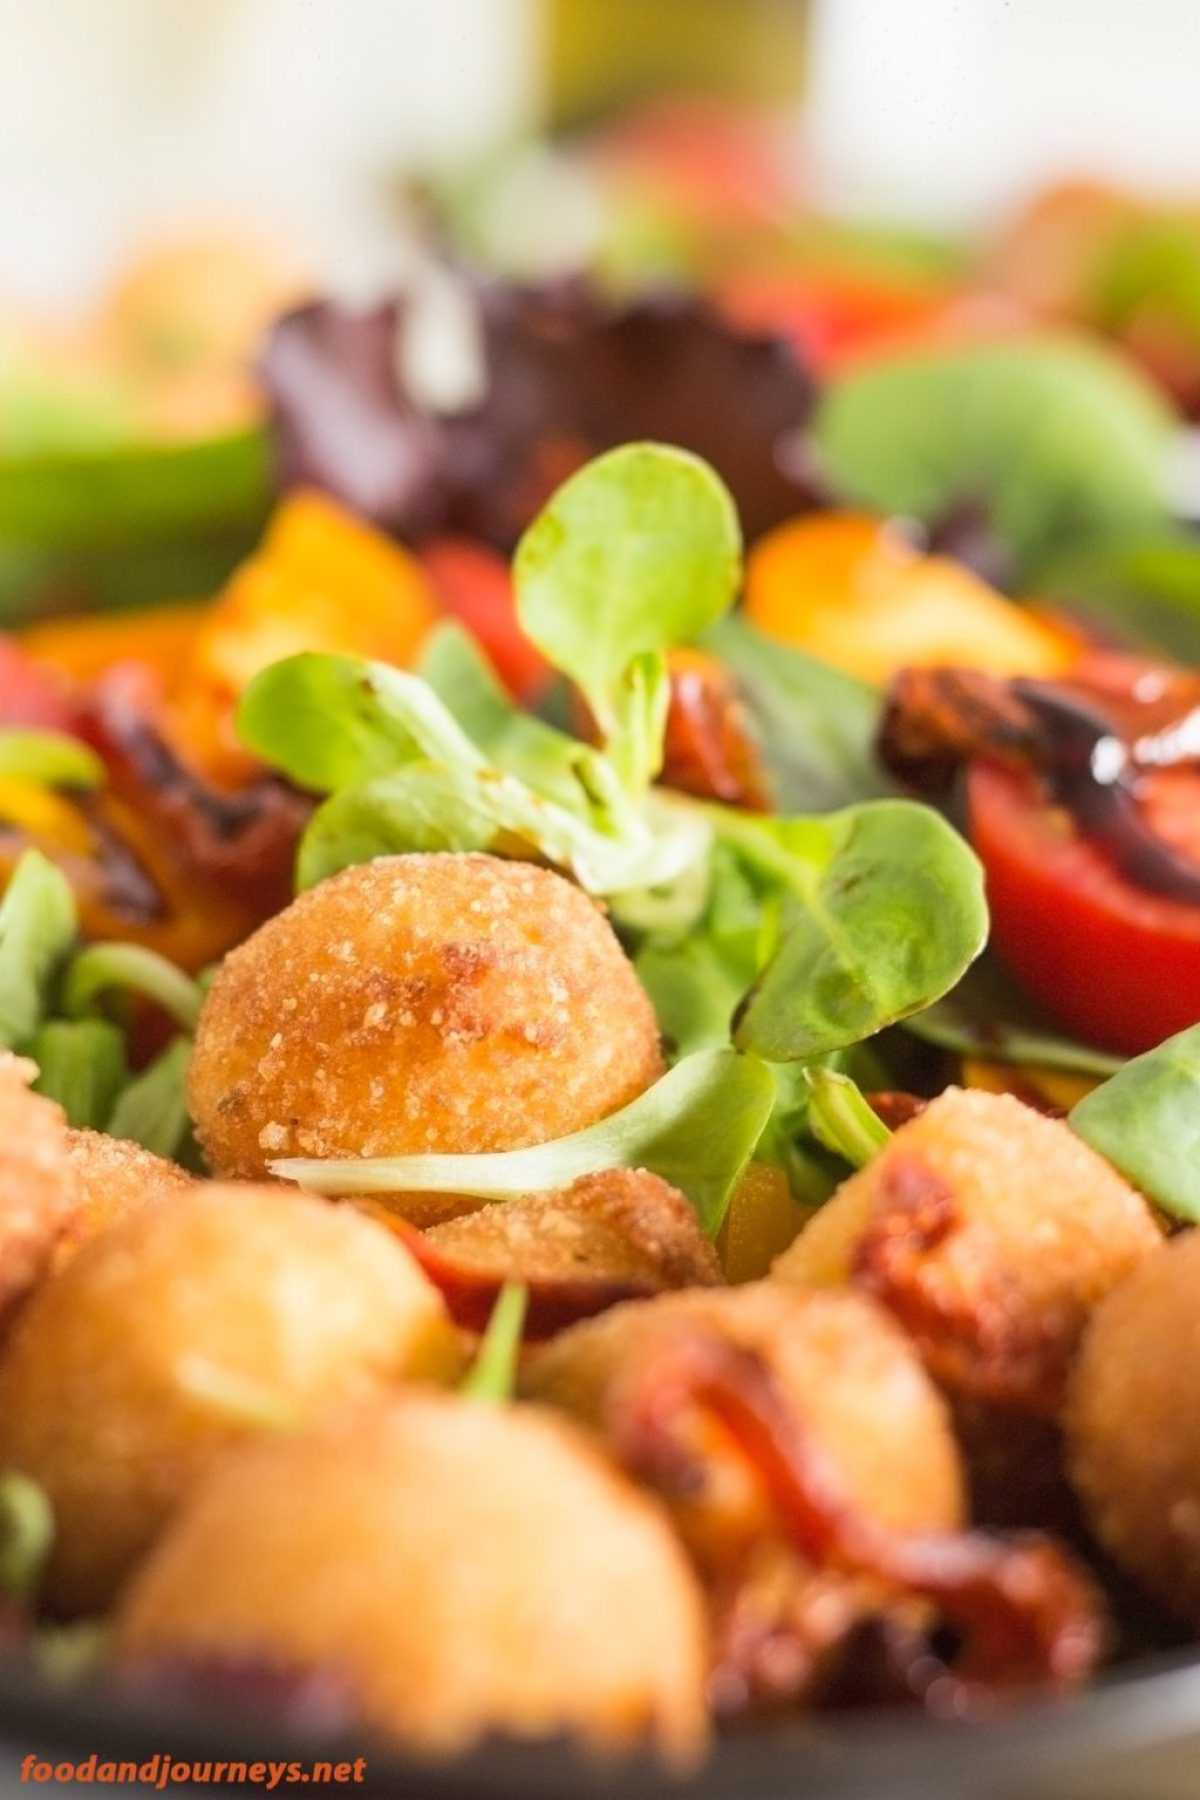 Fried Mozzarella & Tomato Salad pic1|foodandjourneys.net